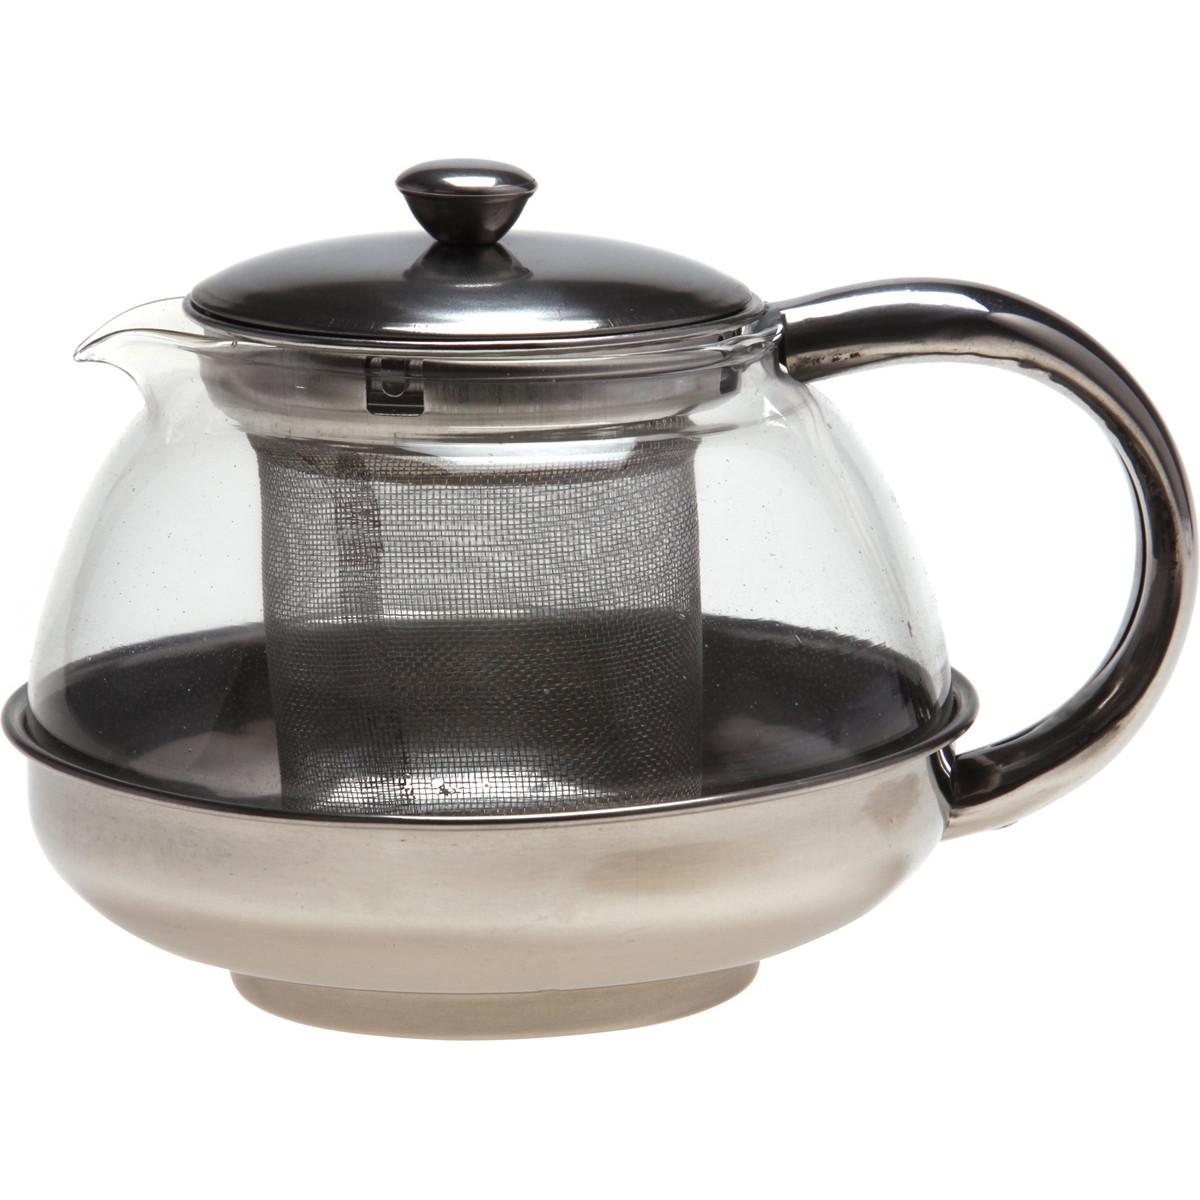 чайник заварочный hunan provincial лотос 600 мл {} Agness Сервиз Salina  (600 мл)